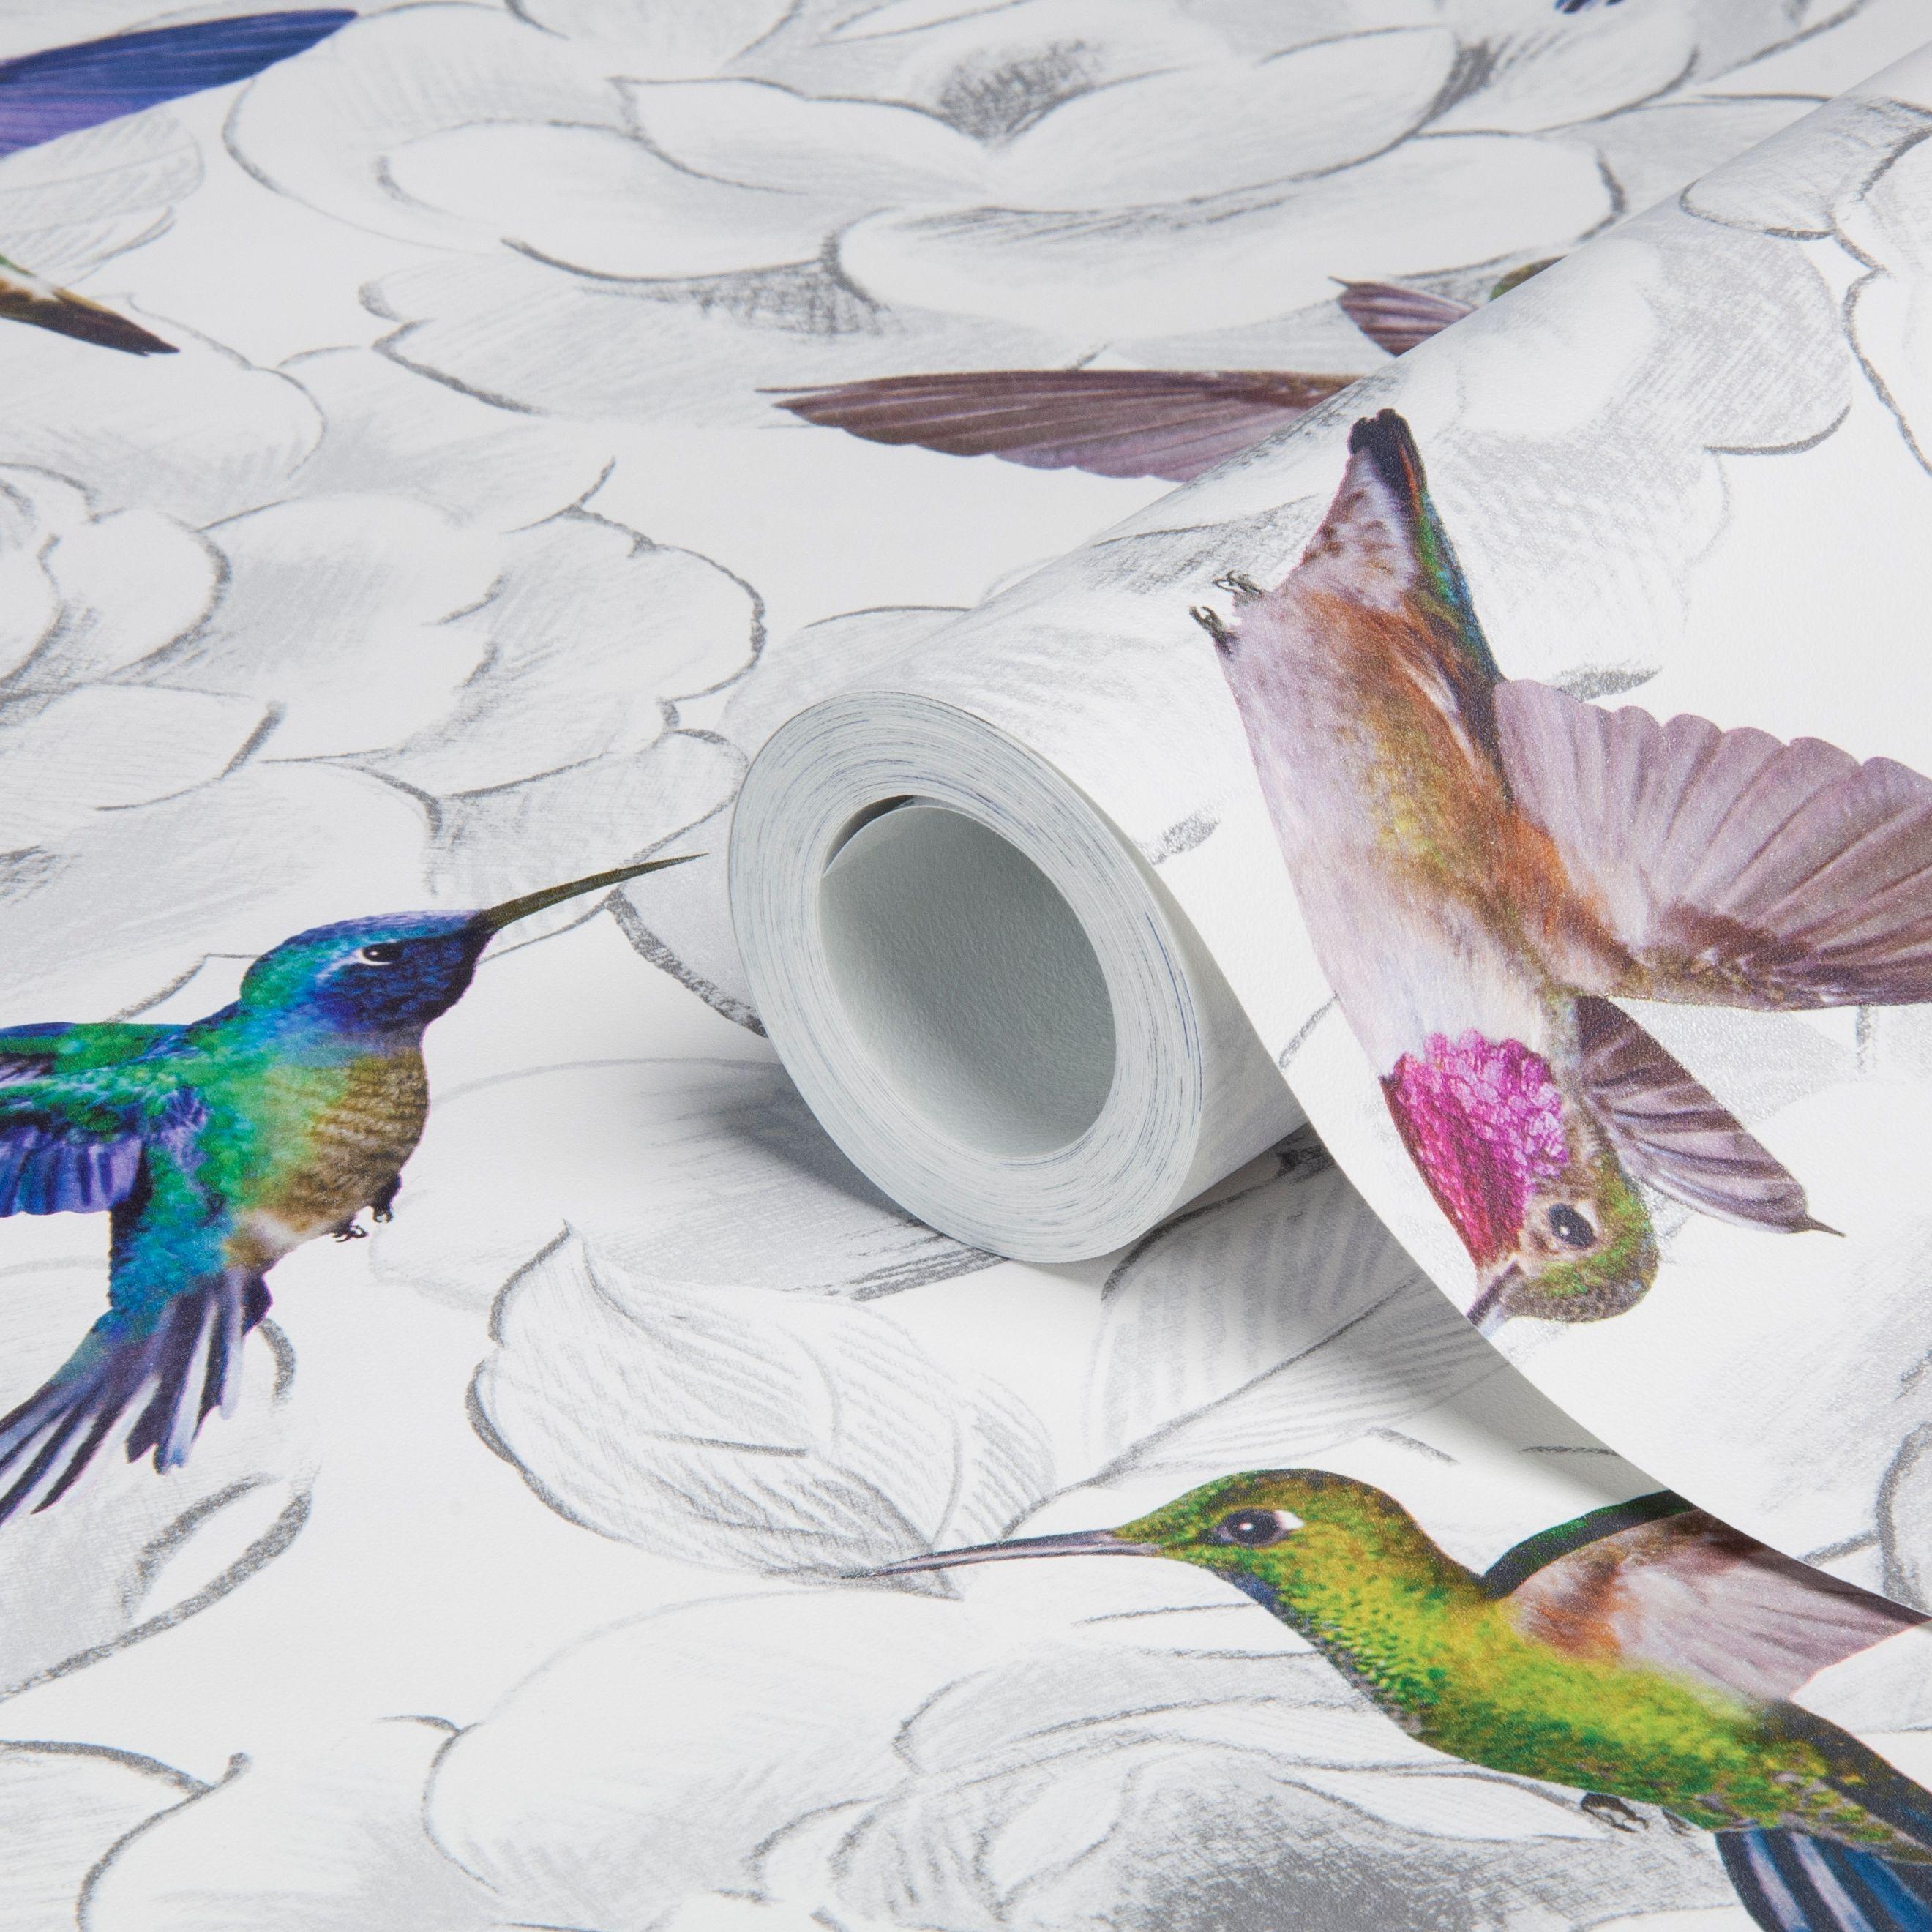 The 25 Best Luxury Wallpaper Ideas On Pinterest: The 25+ Best Hummingbird Wallpaper Ideas On Pinterest